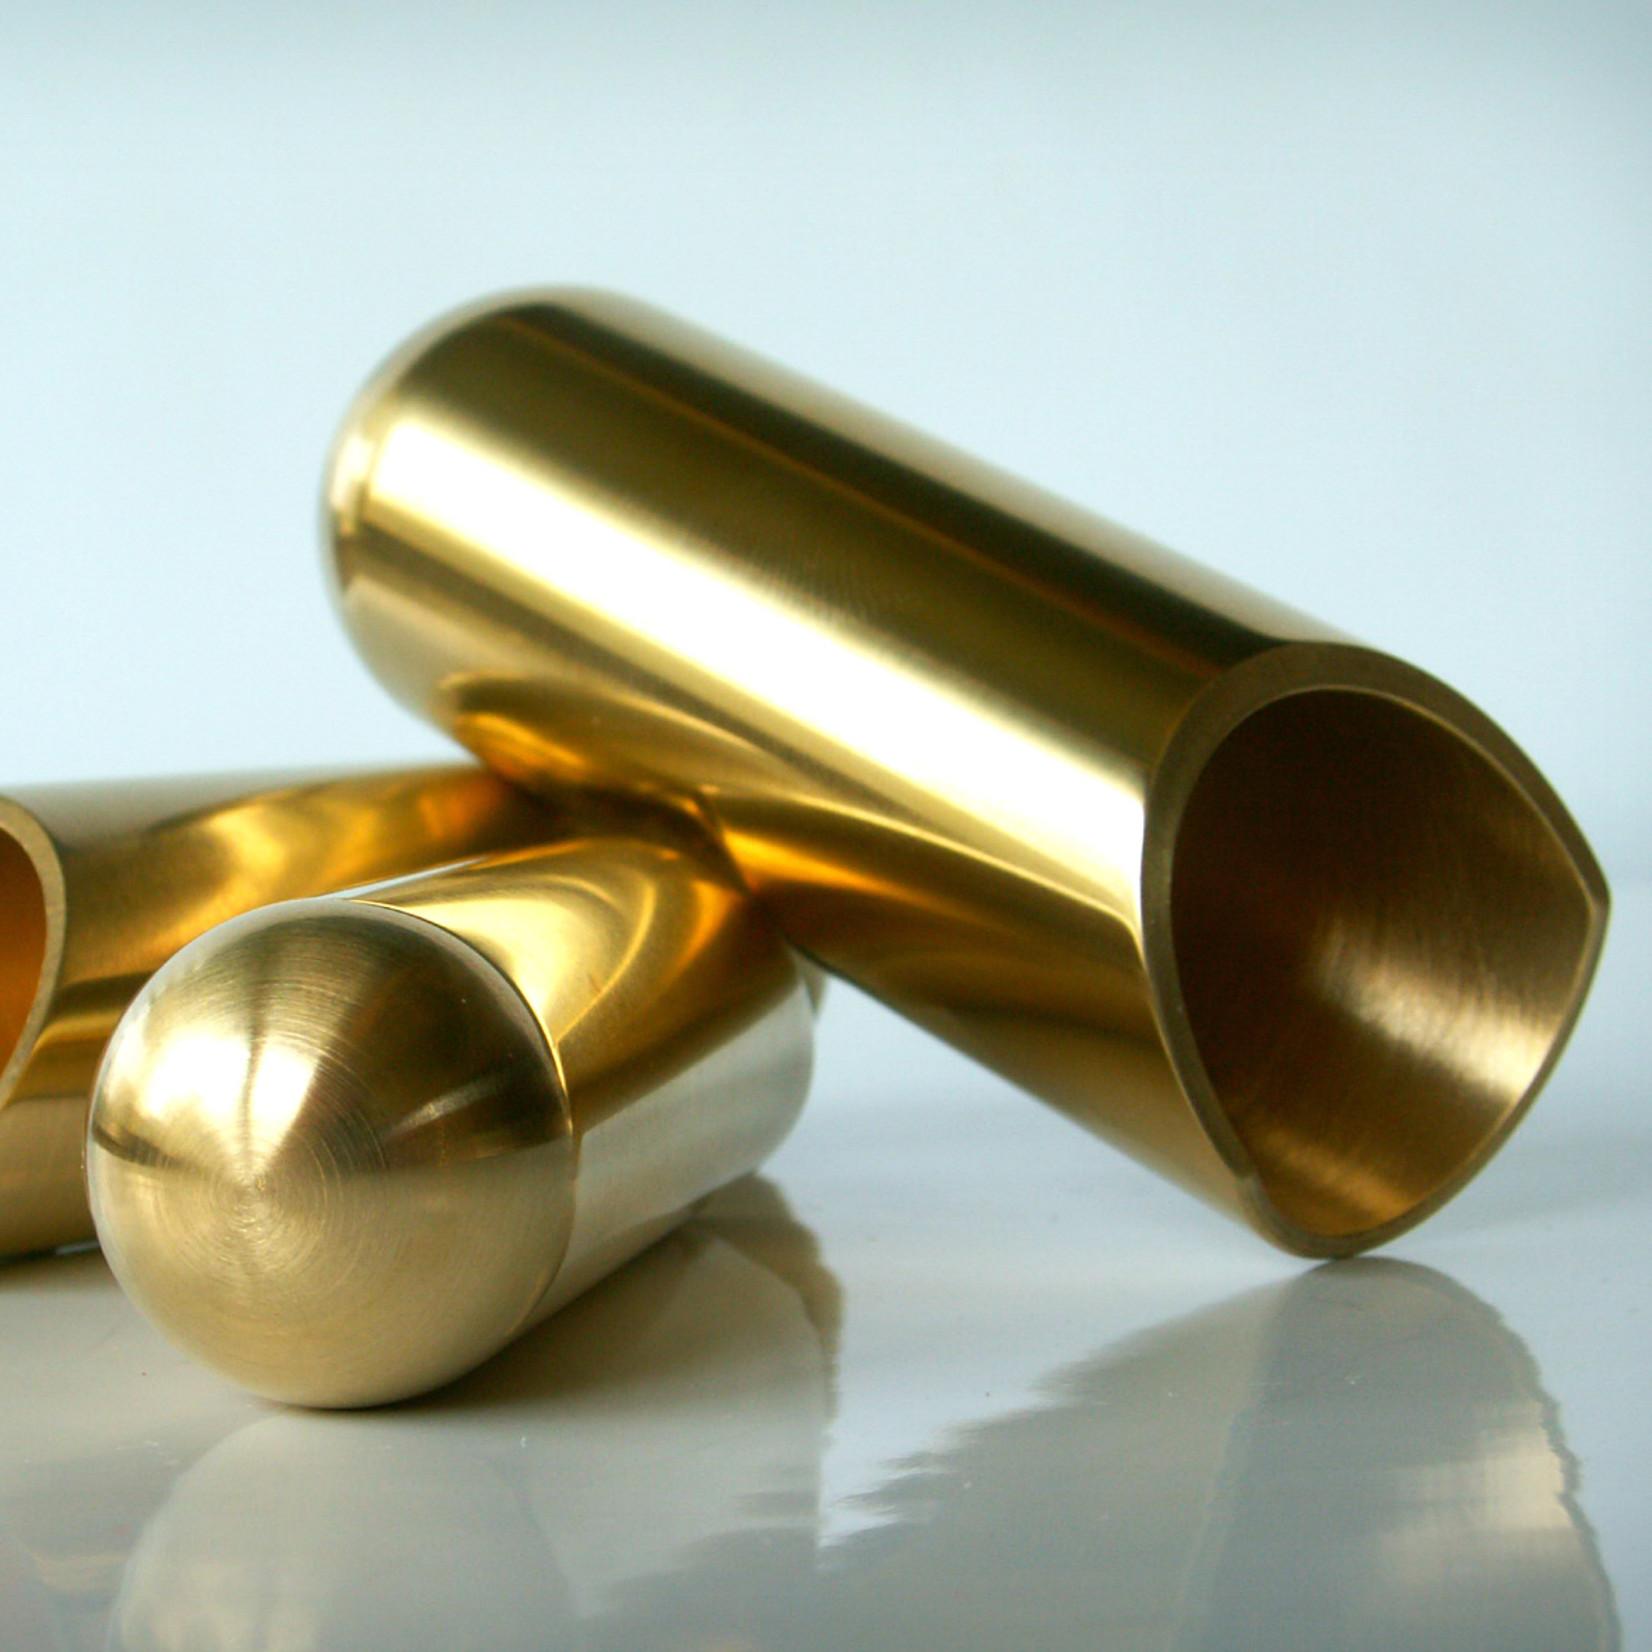 The Rock Slide The Rock Slide-Small Balltip Guitar Slide, Polished Brass, BTRS-SB - 17.5mm x 57mm, Ring Size 6-8